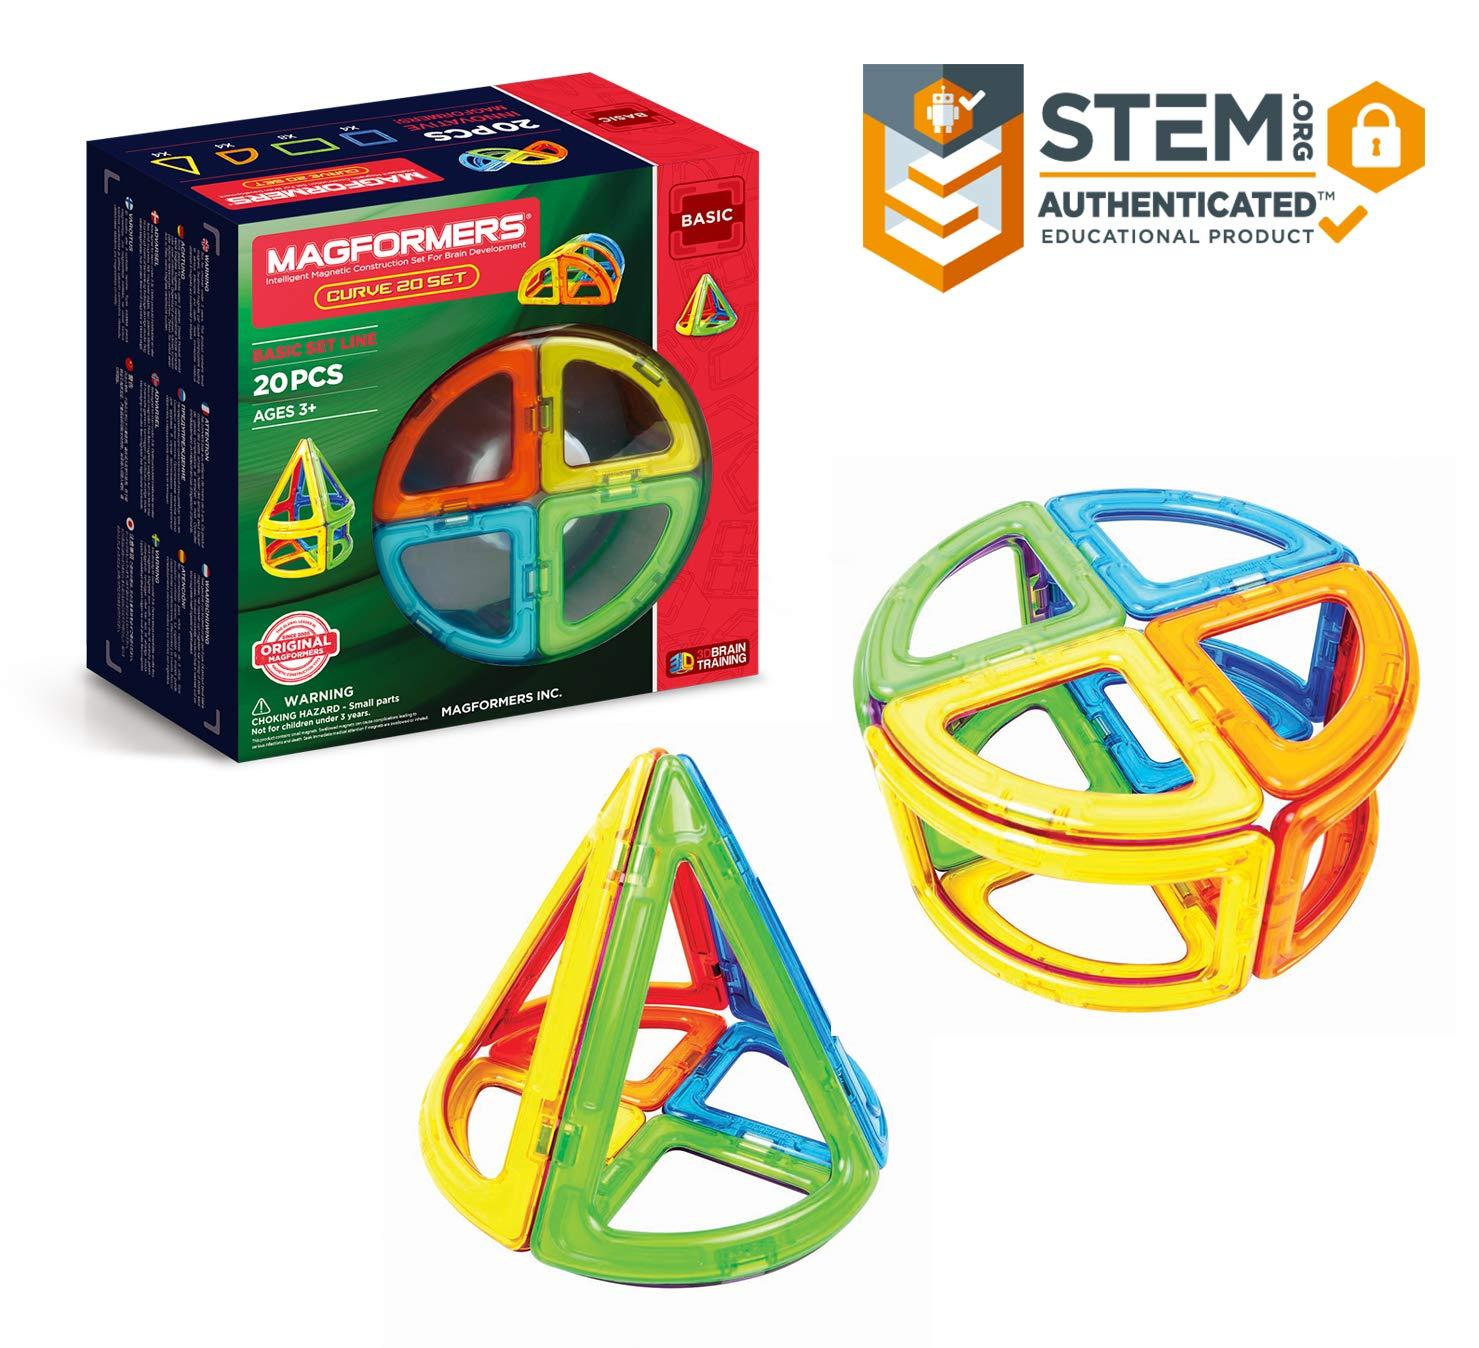 Magformers Curve (20ピース) ブロックセット レインボーカラー 磁気ブロック 教育用磁気タイルキット 磁気構造 STEMおもちゃセット   B06XJLTRQJ